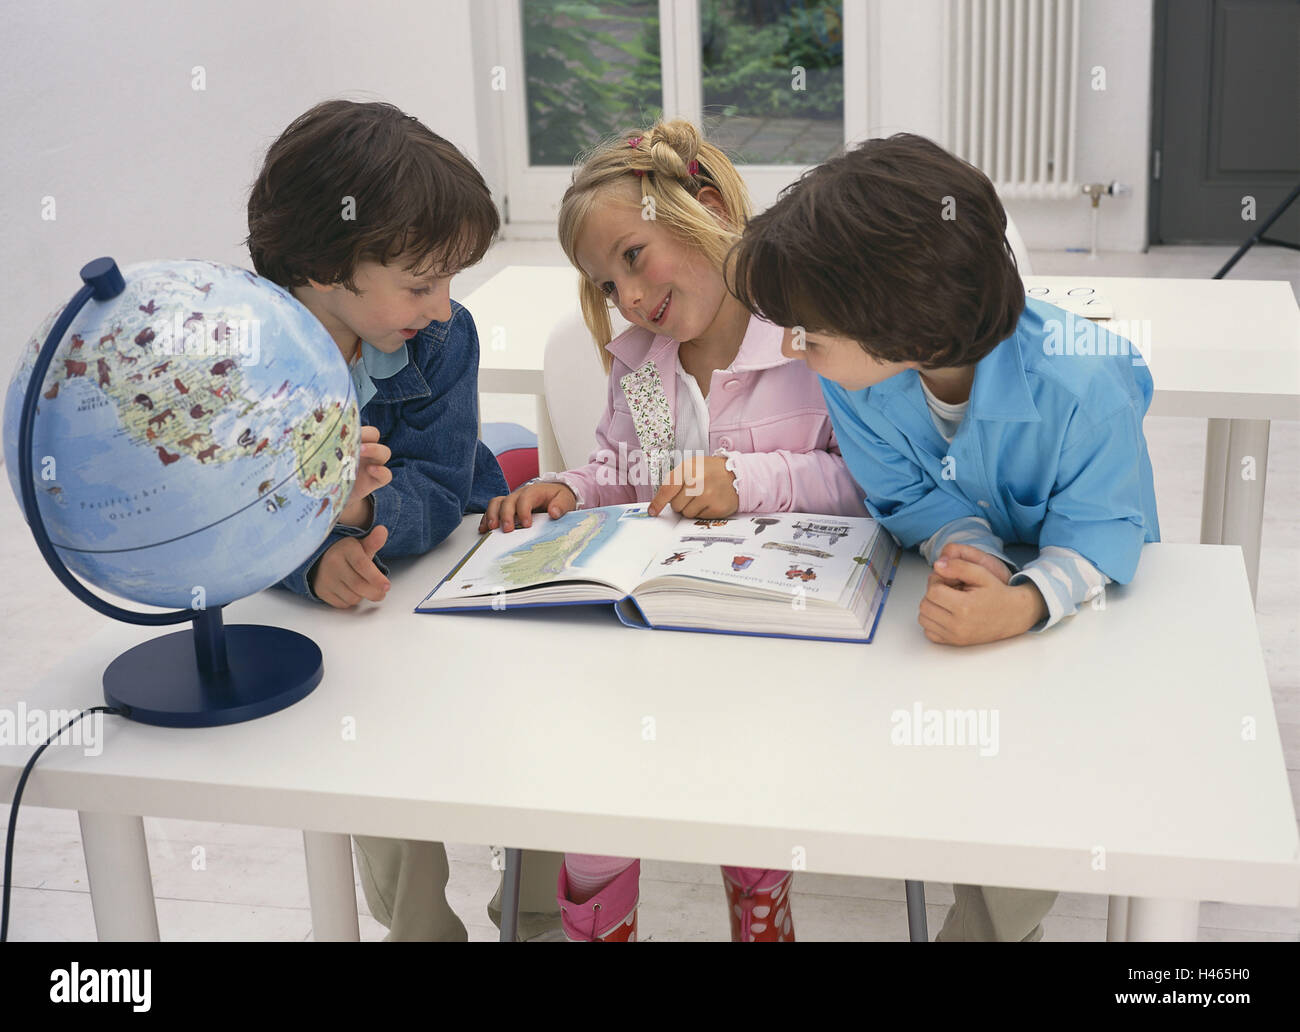 Classrooms, boys, girls, book, child globe, happy, school, school desk, person, children, three, twins, siblings, Stock Photo